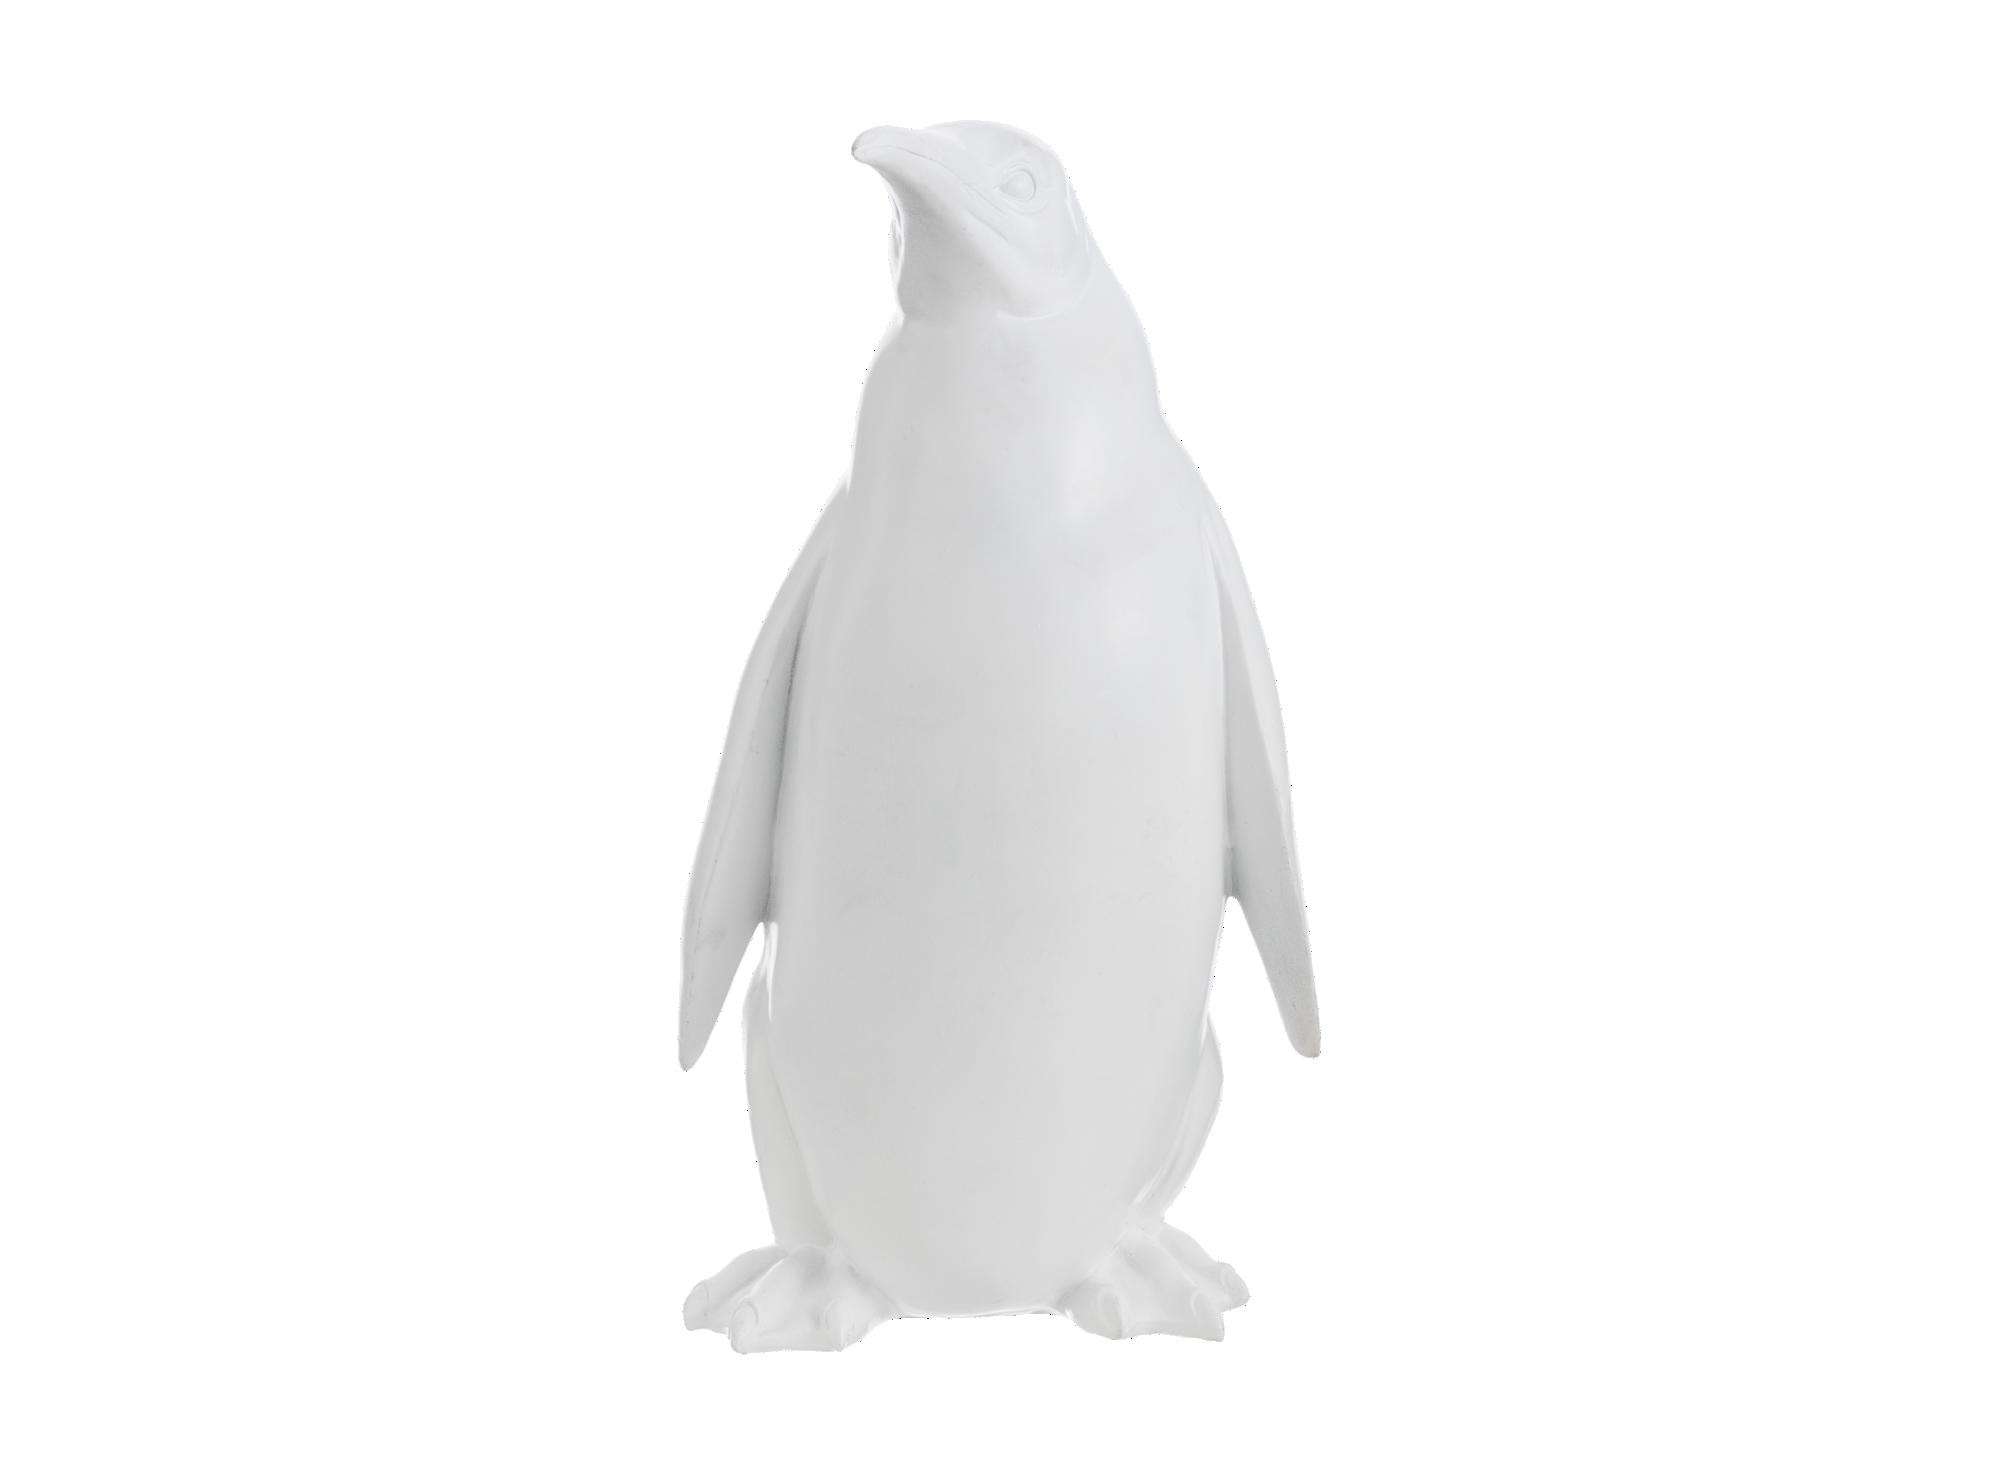 Deco pinguin h31cm coloris bla nc  en resines